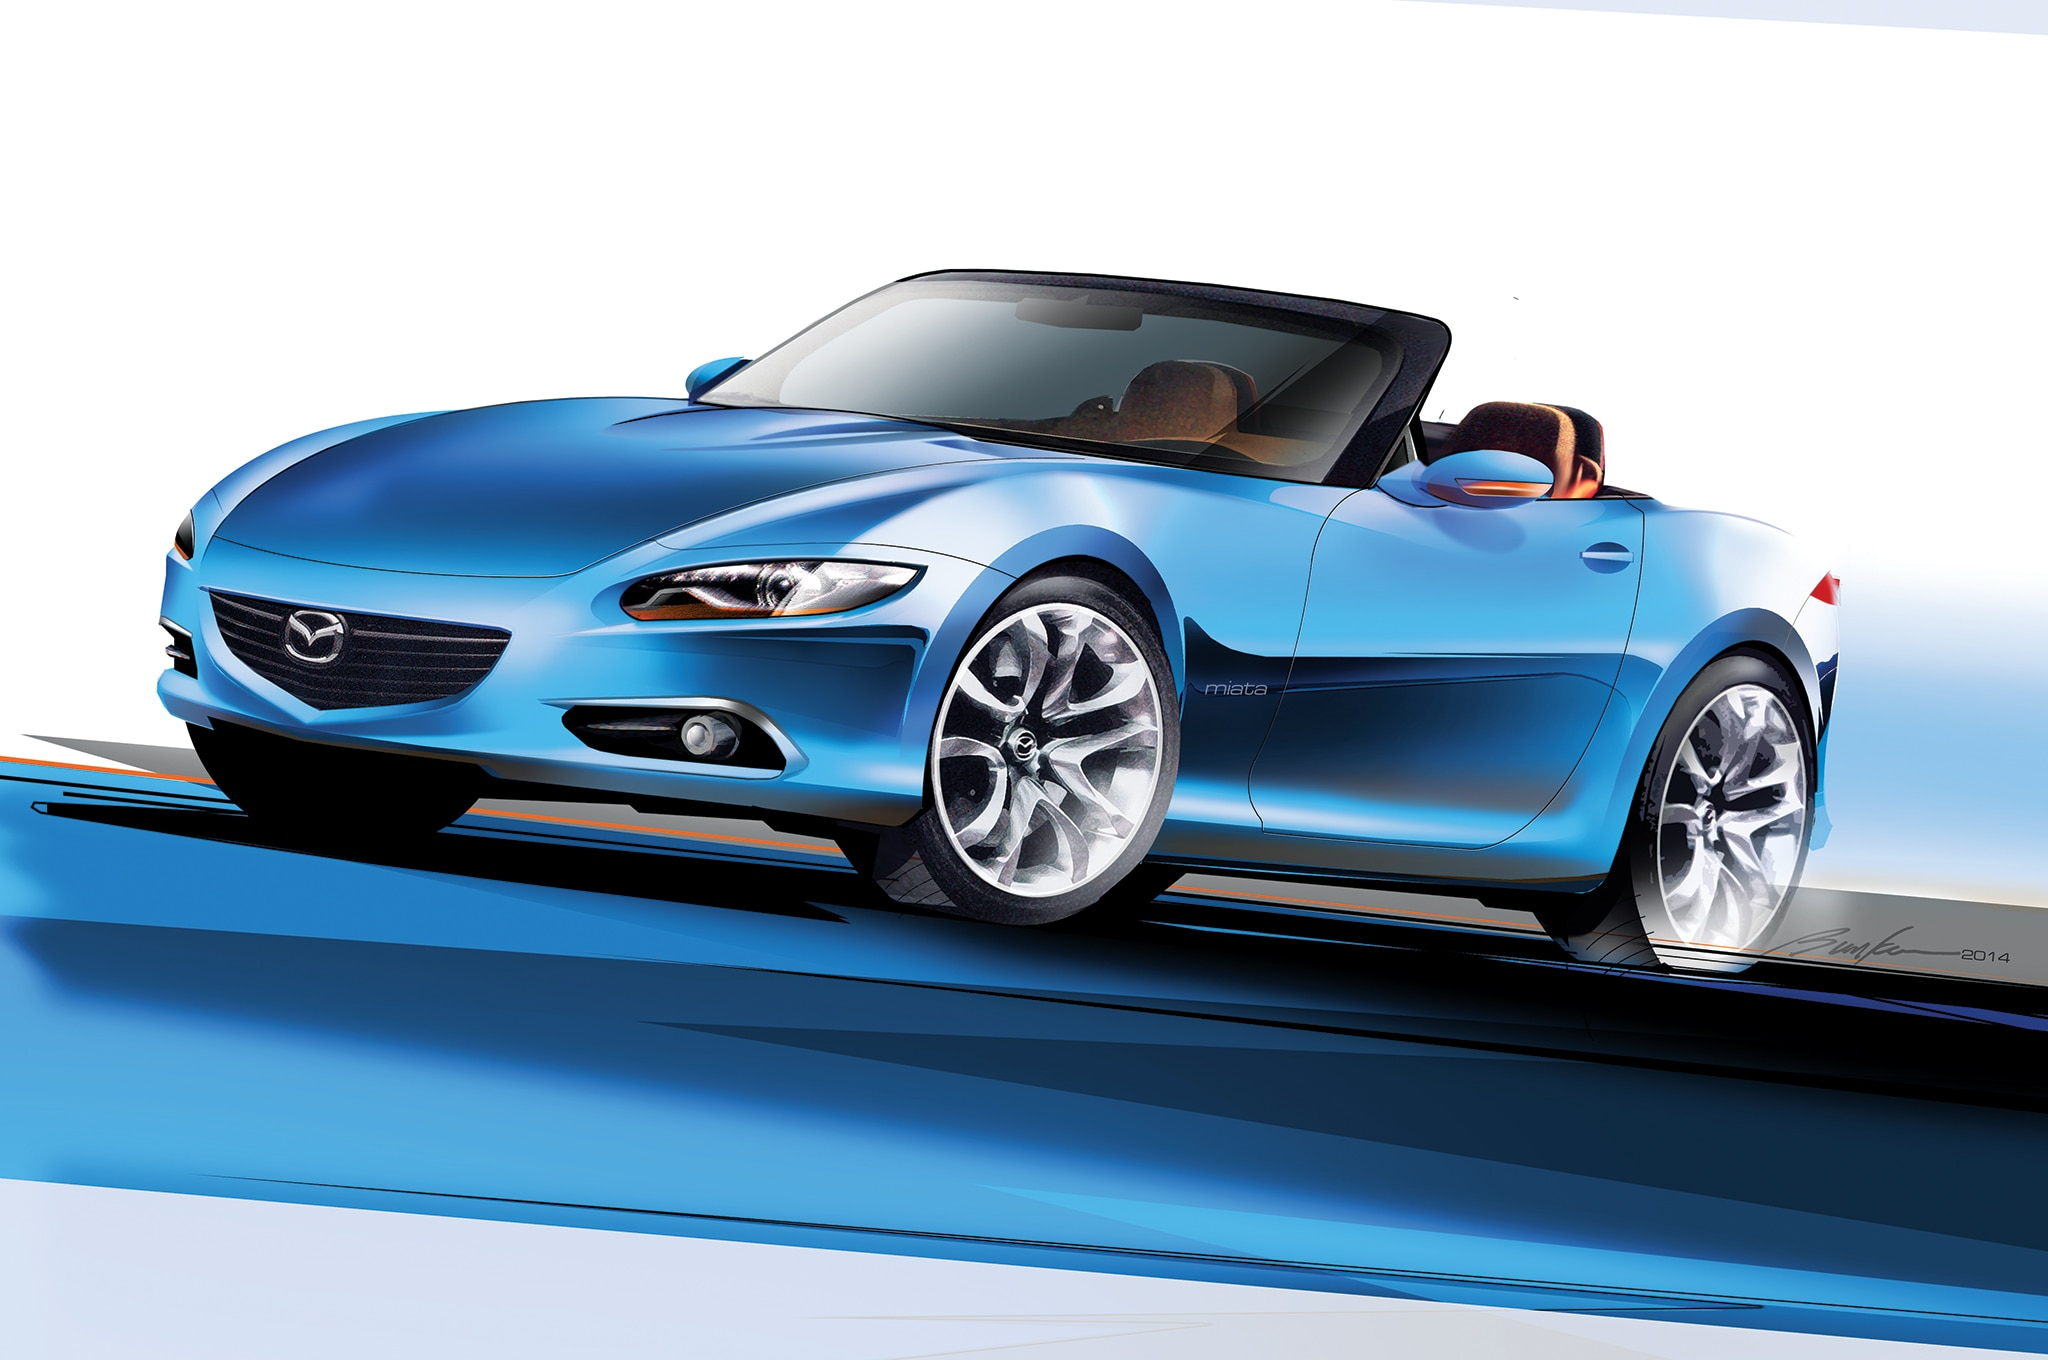 2016 Mazda Mx 5 Miata Sneak Preview